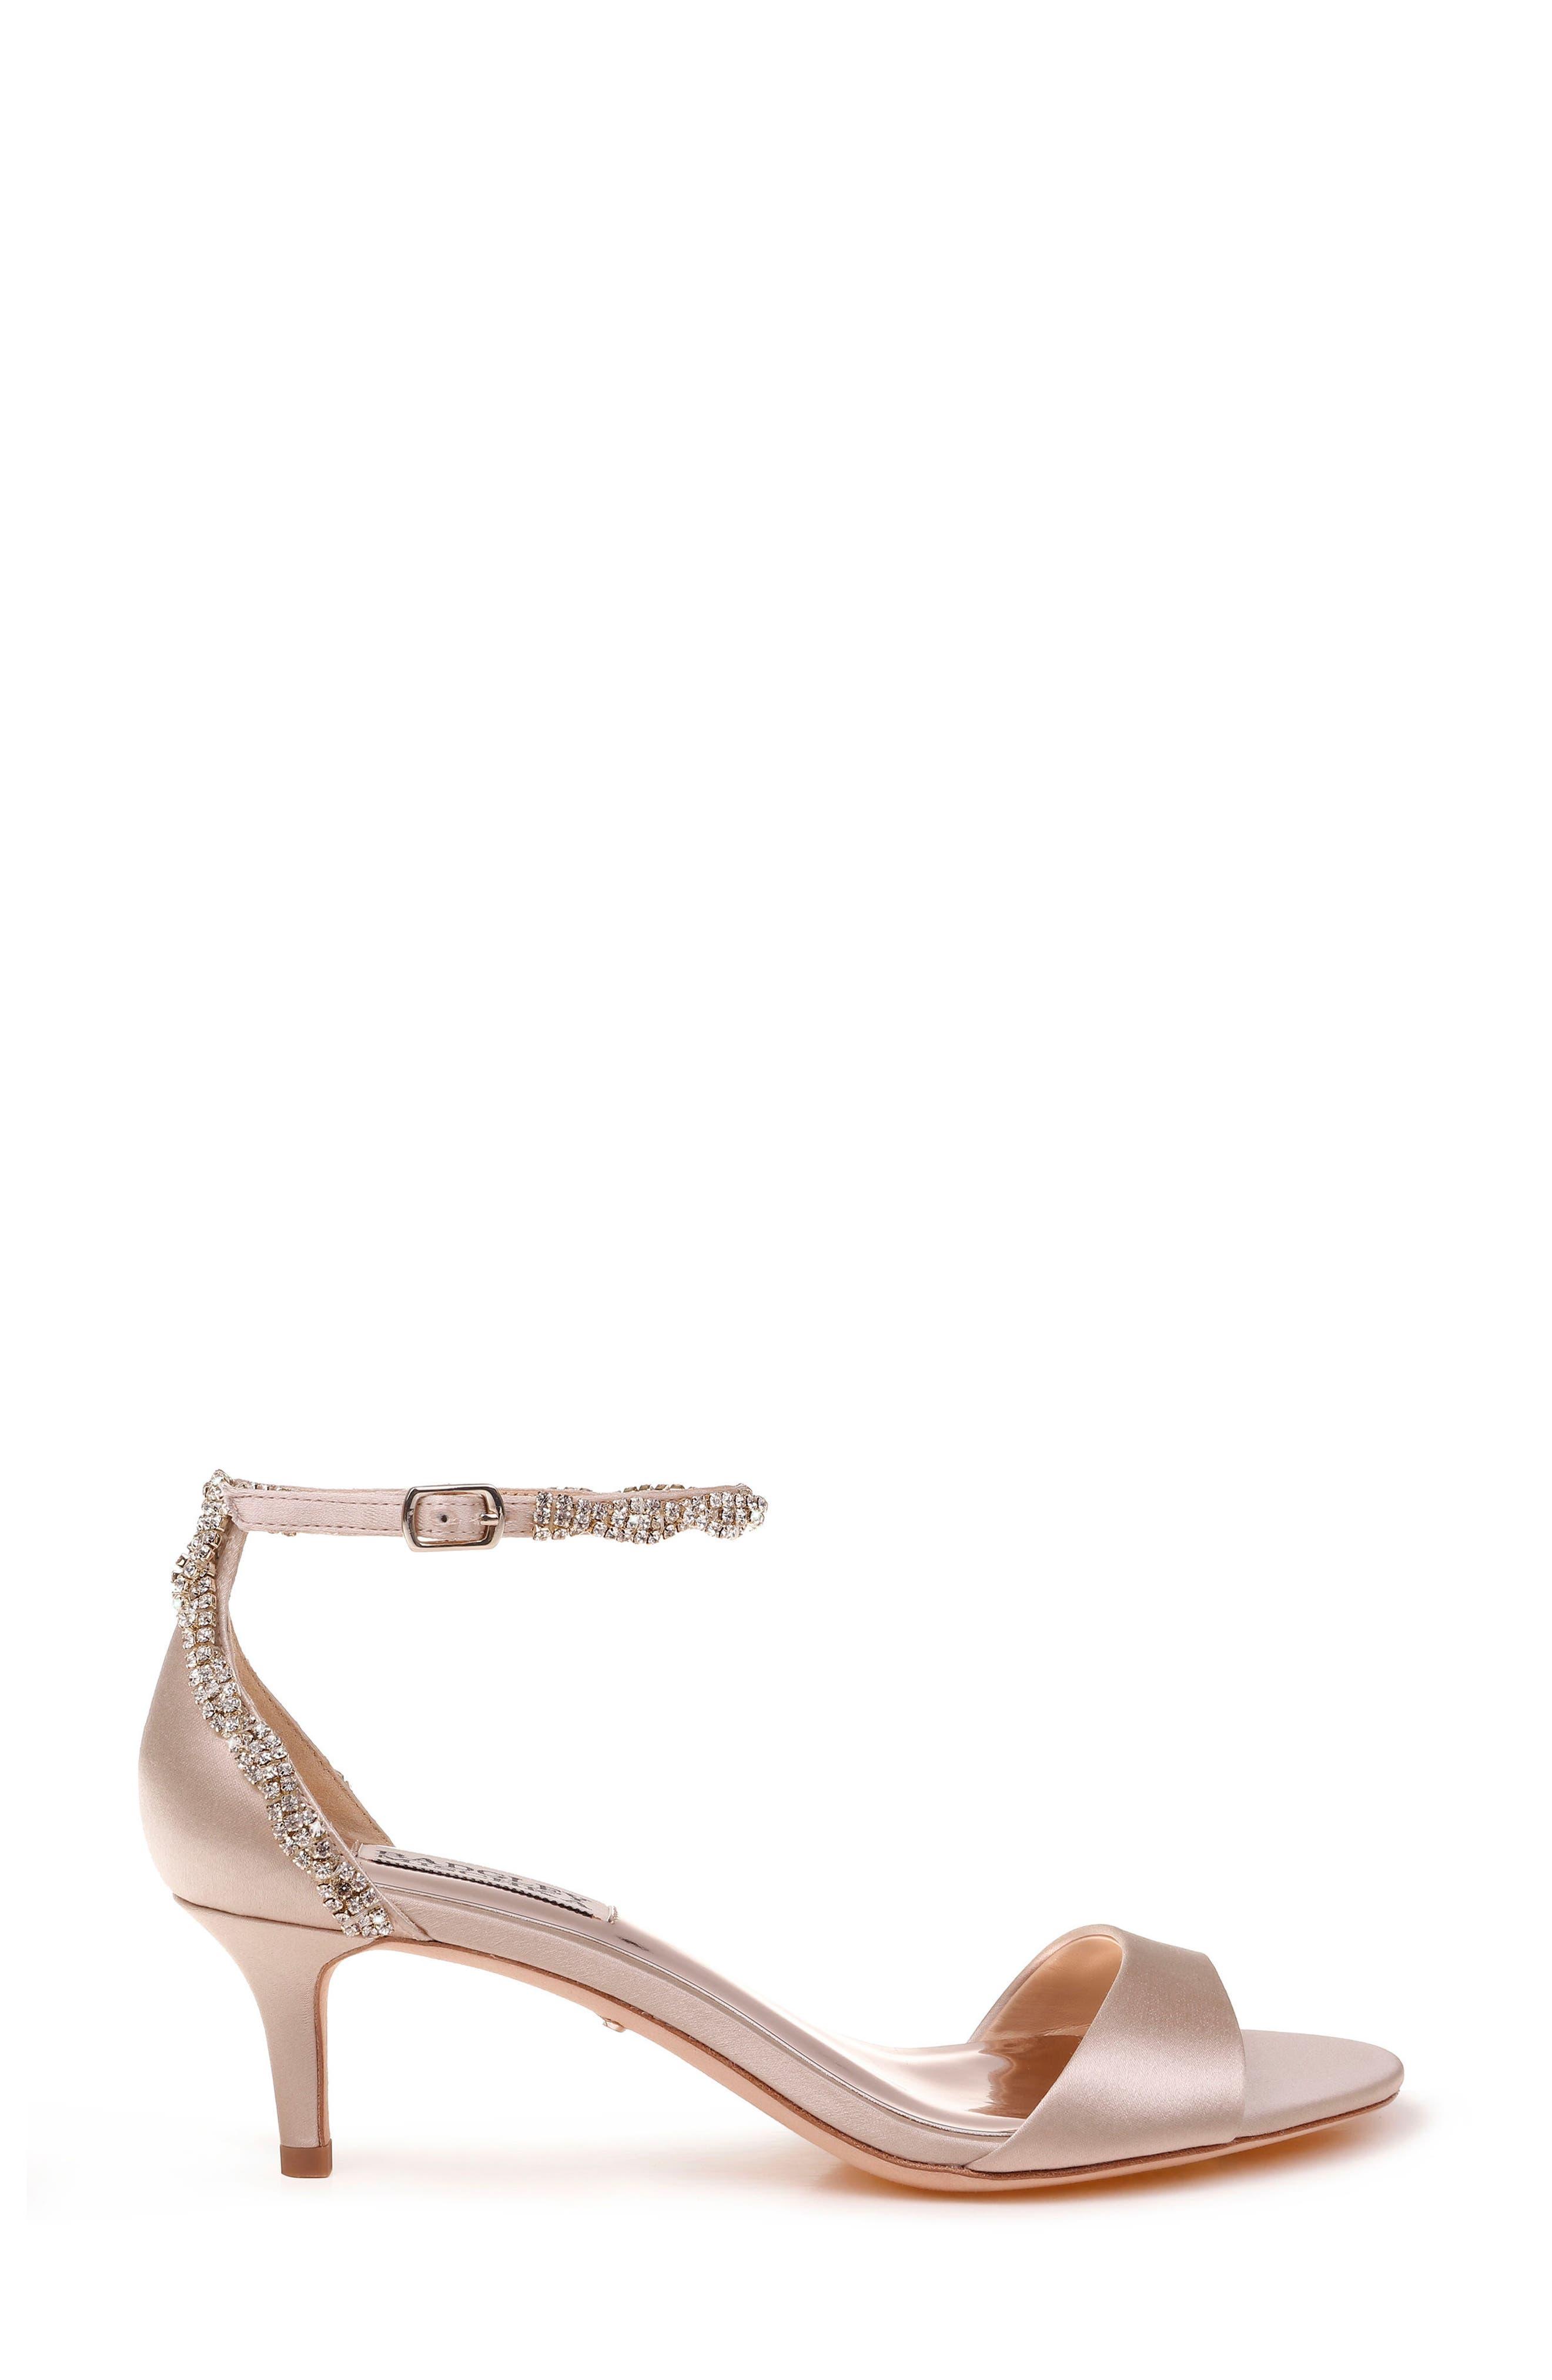 Yareli Crystal Embellished Sandal,                             Alternate thumbnail 3, color,                             NUDE SATIN